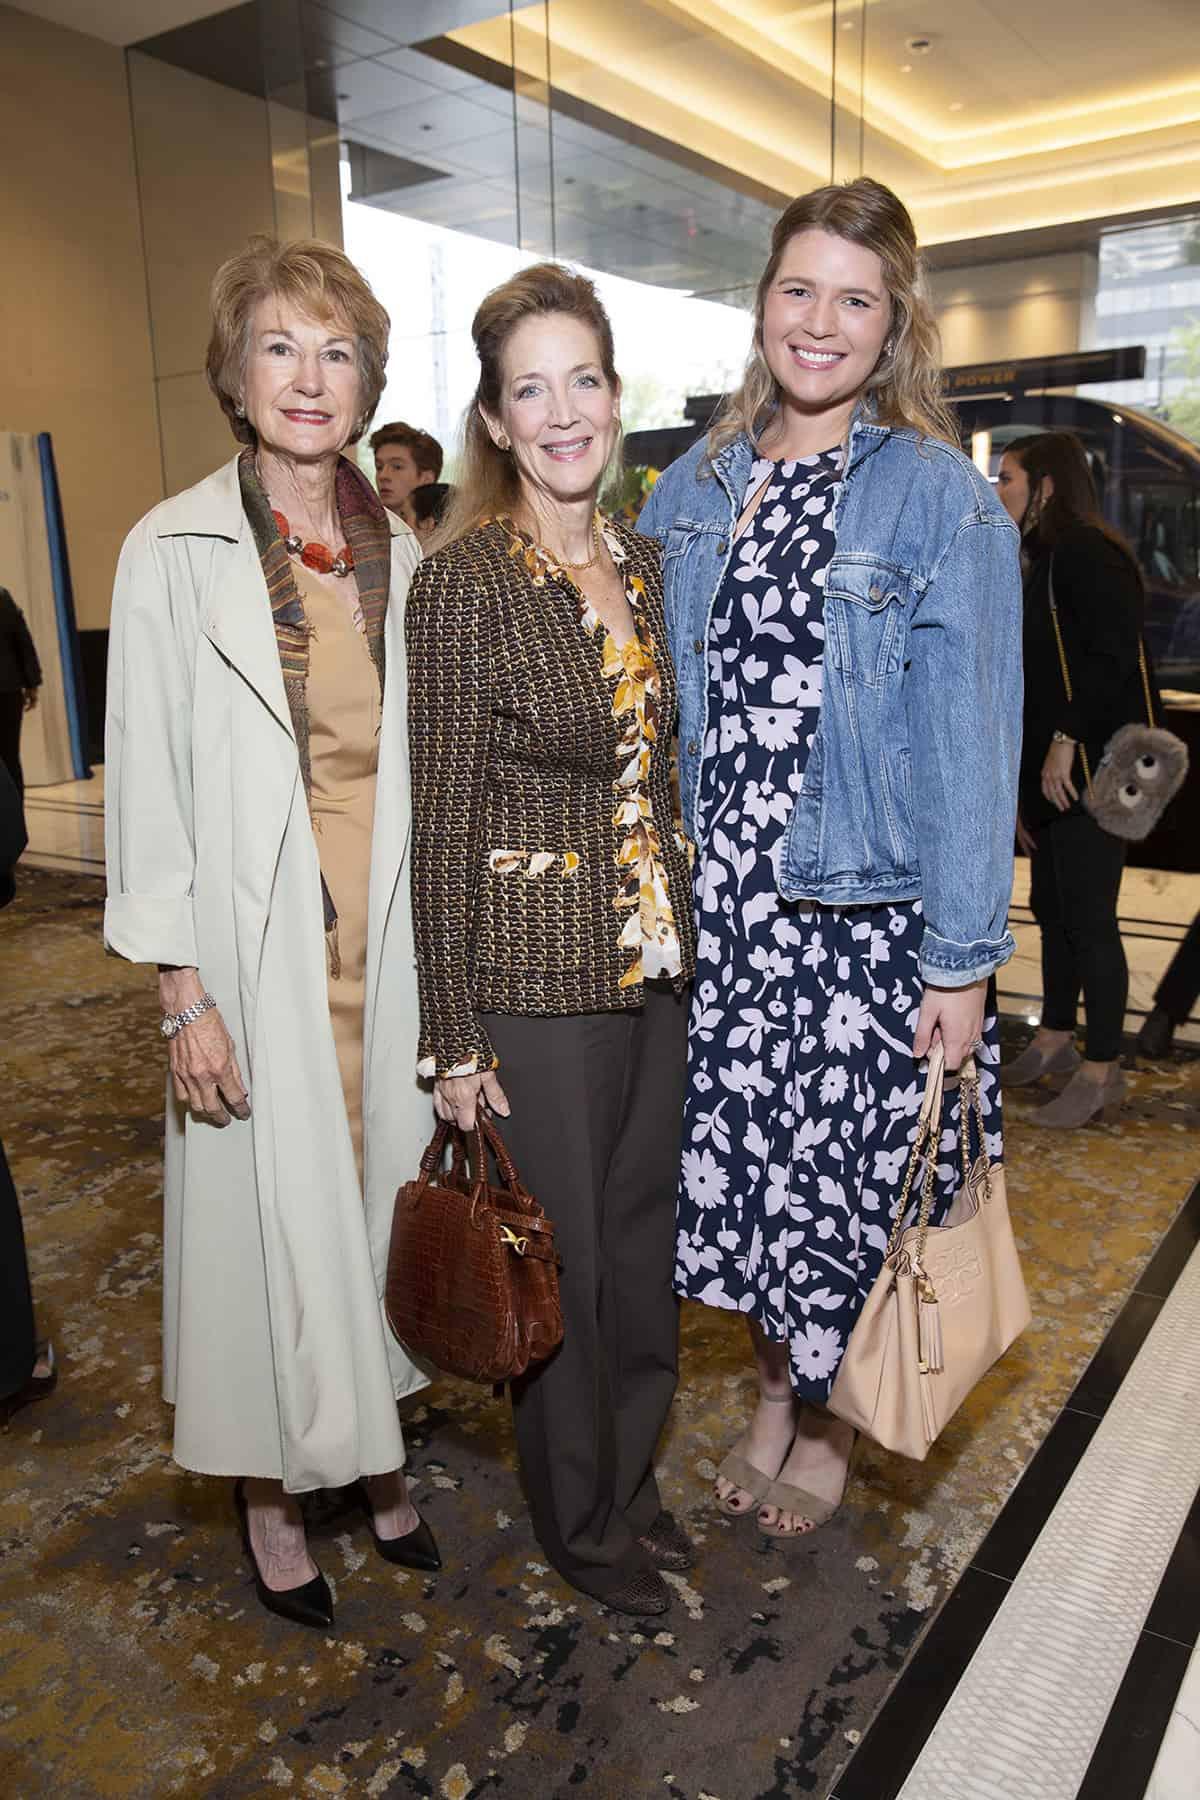 Laura McWilliams, Florence Langford, and Vivian Langford